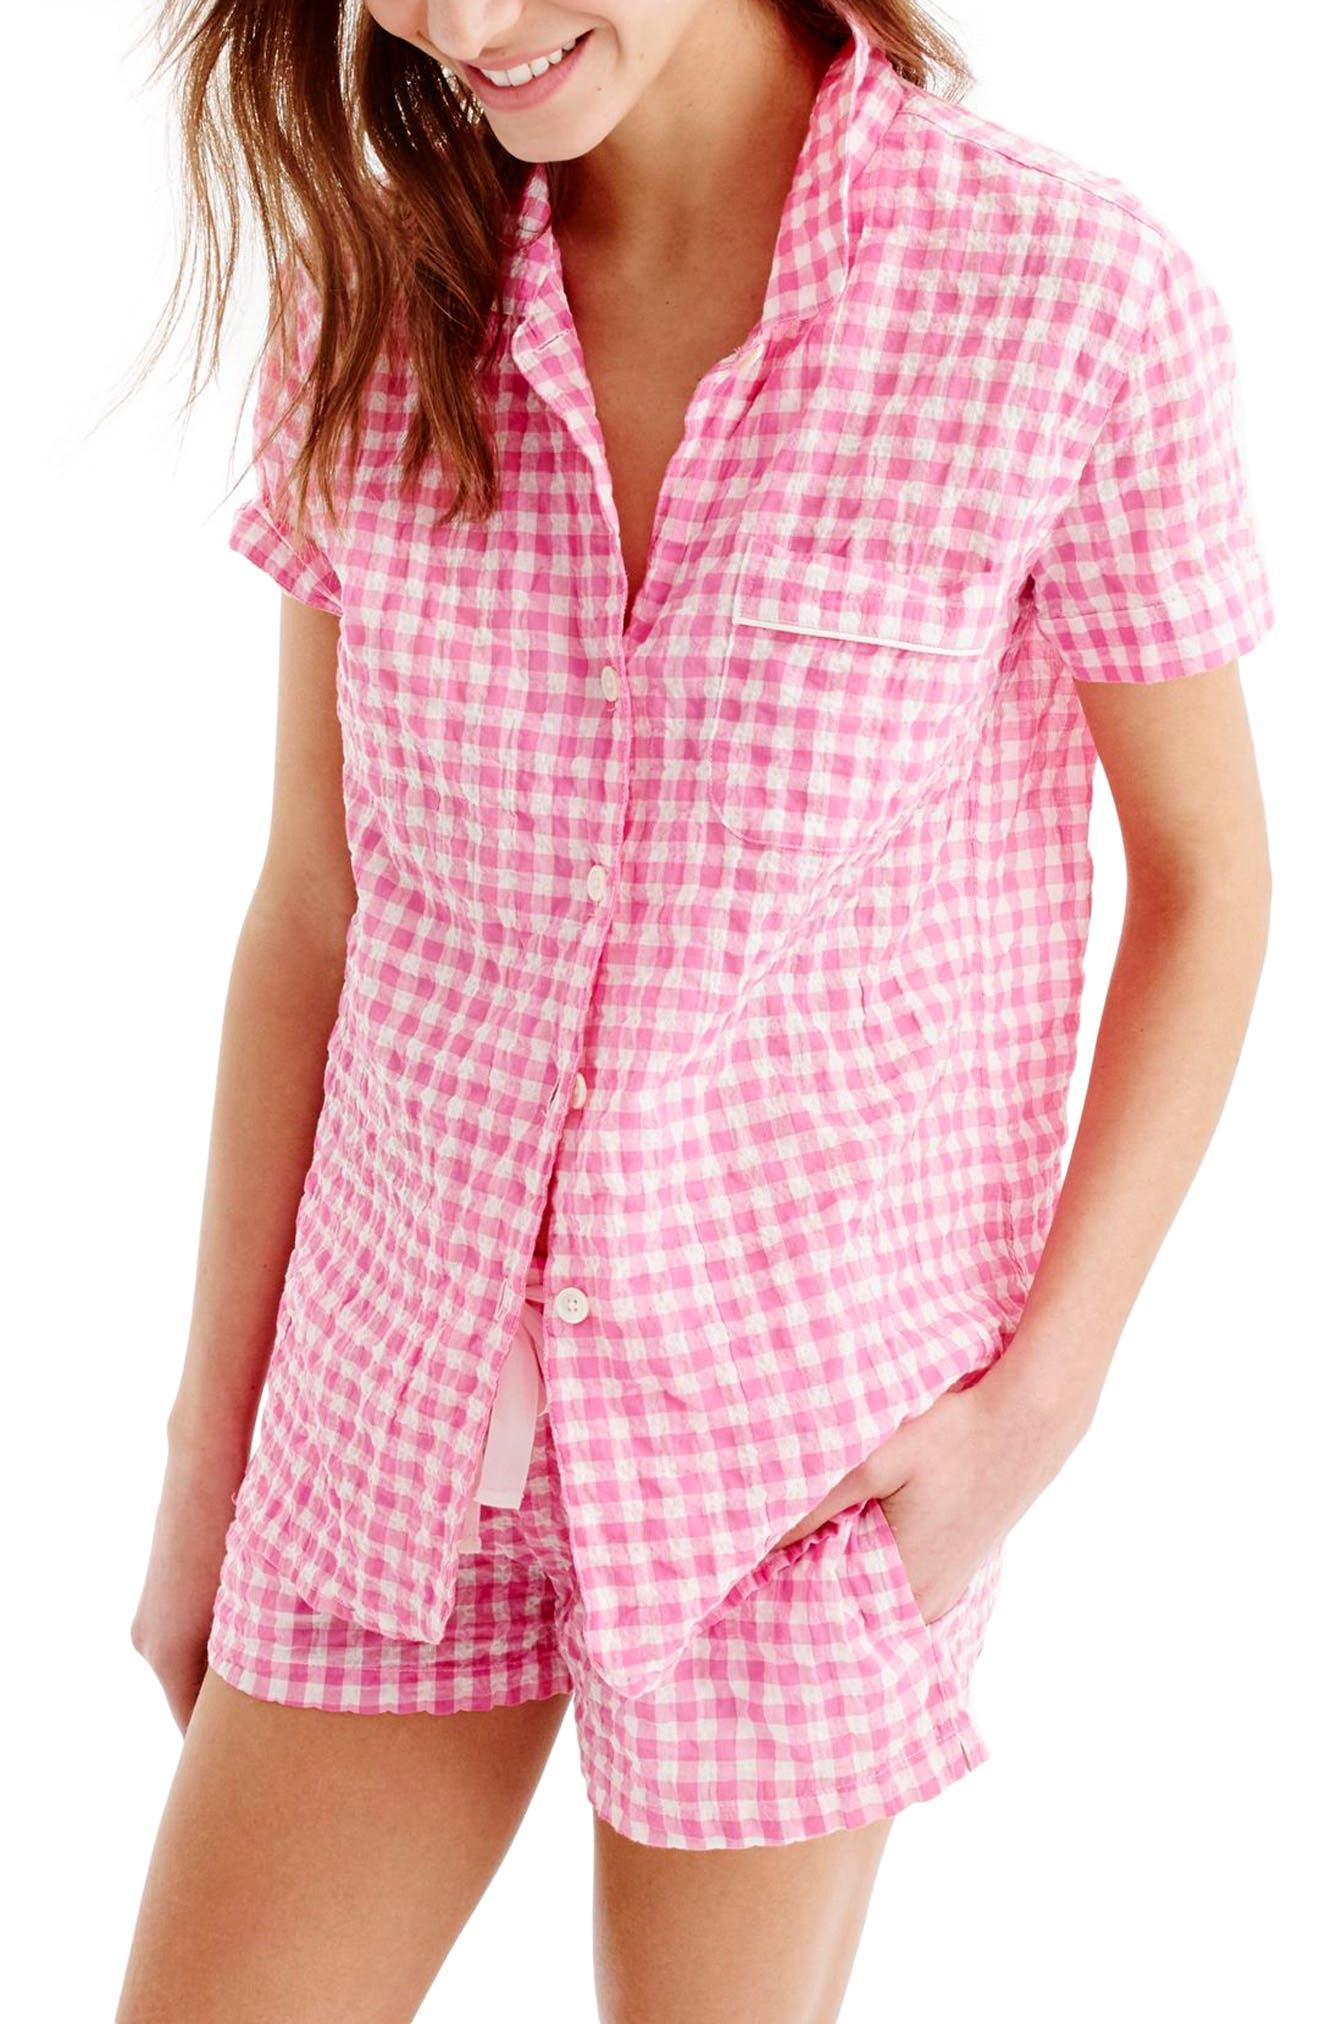 J.Crew Gingham Pajama Set,                             Main thumbnail 1, color,                             Ivory Pink